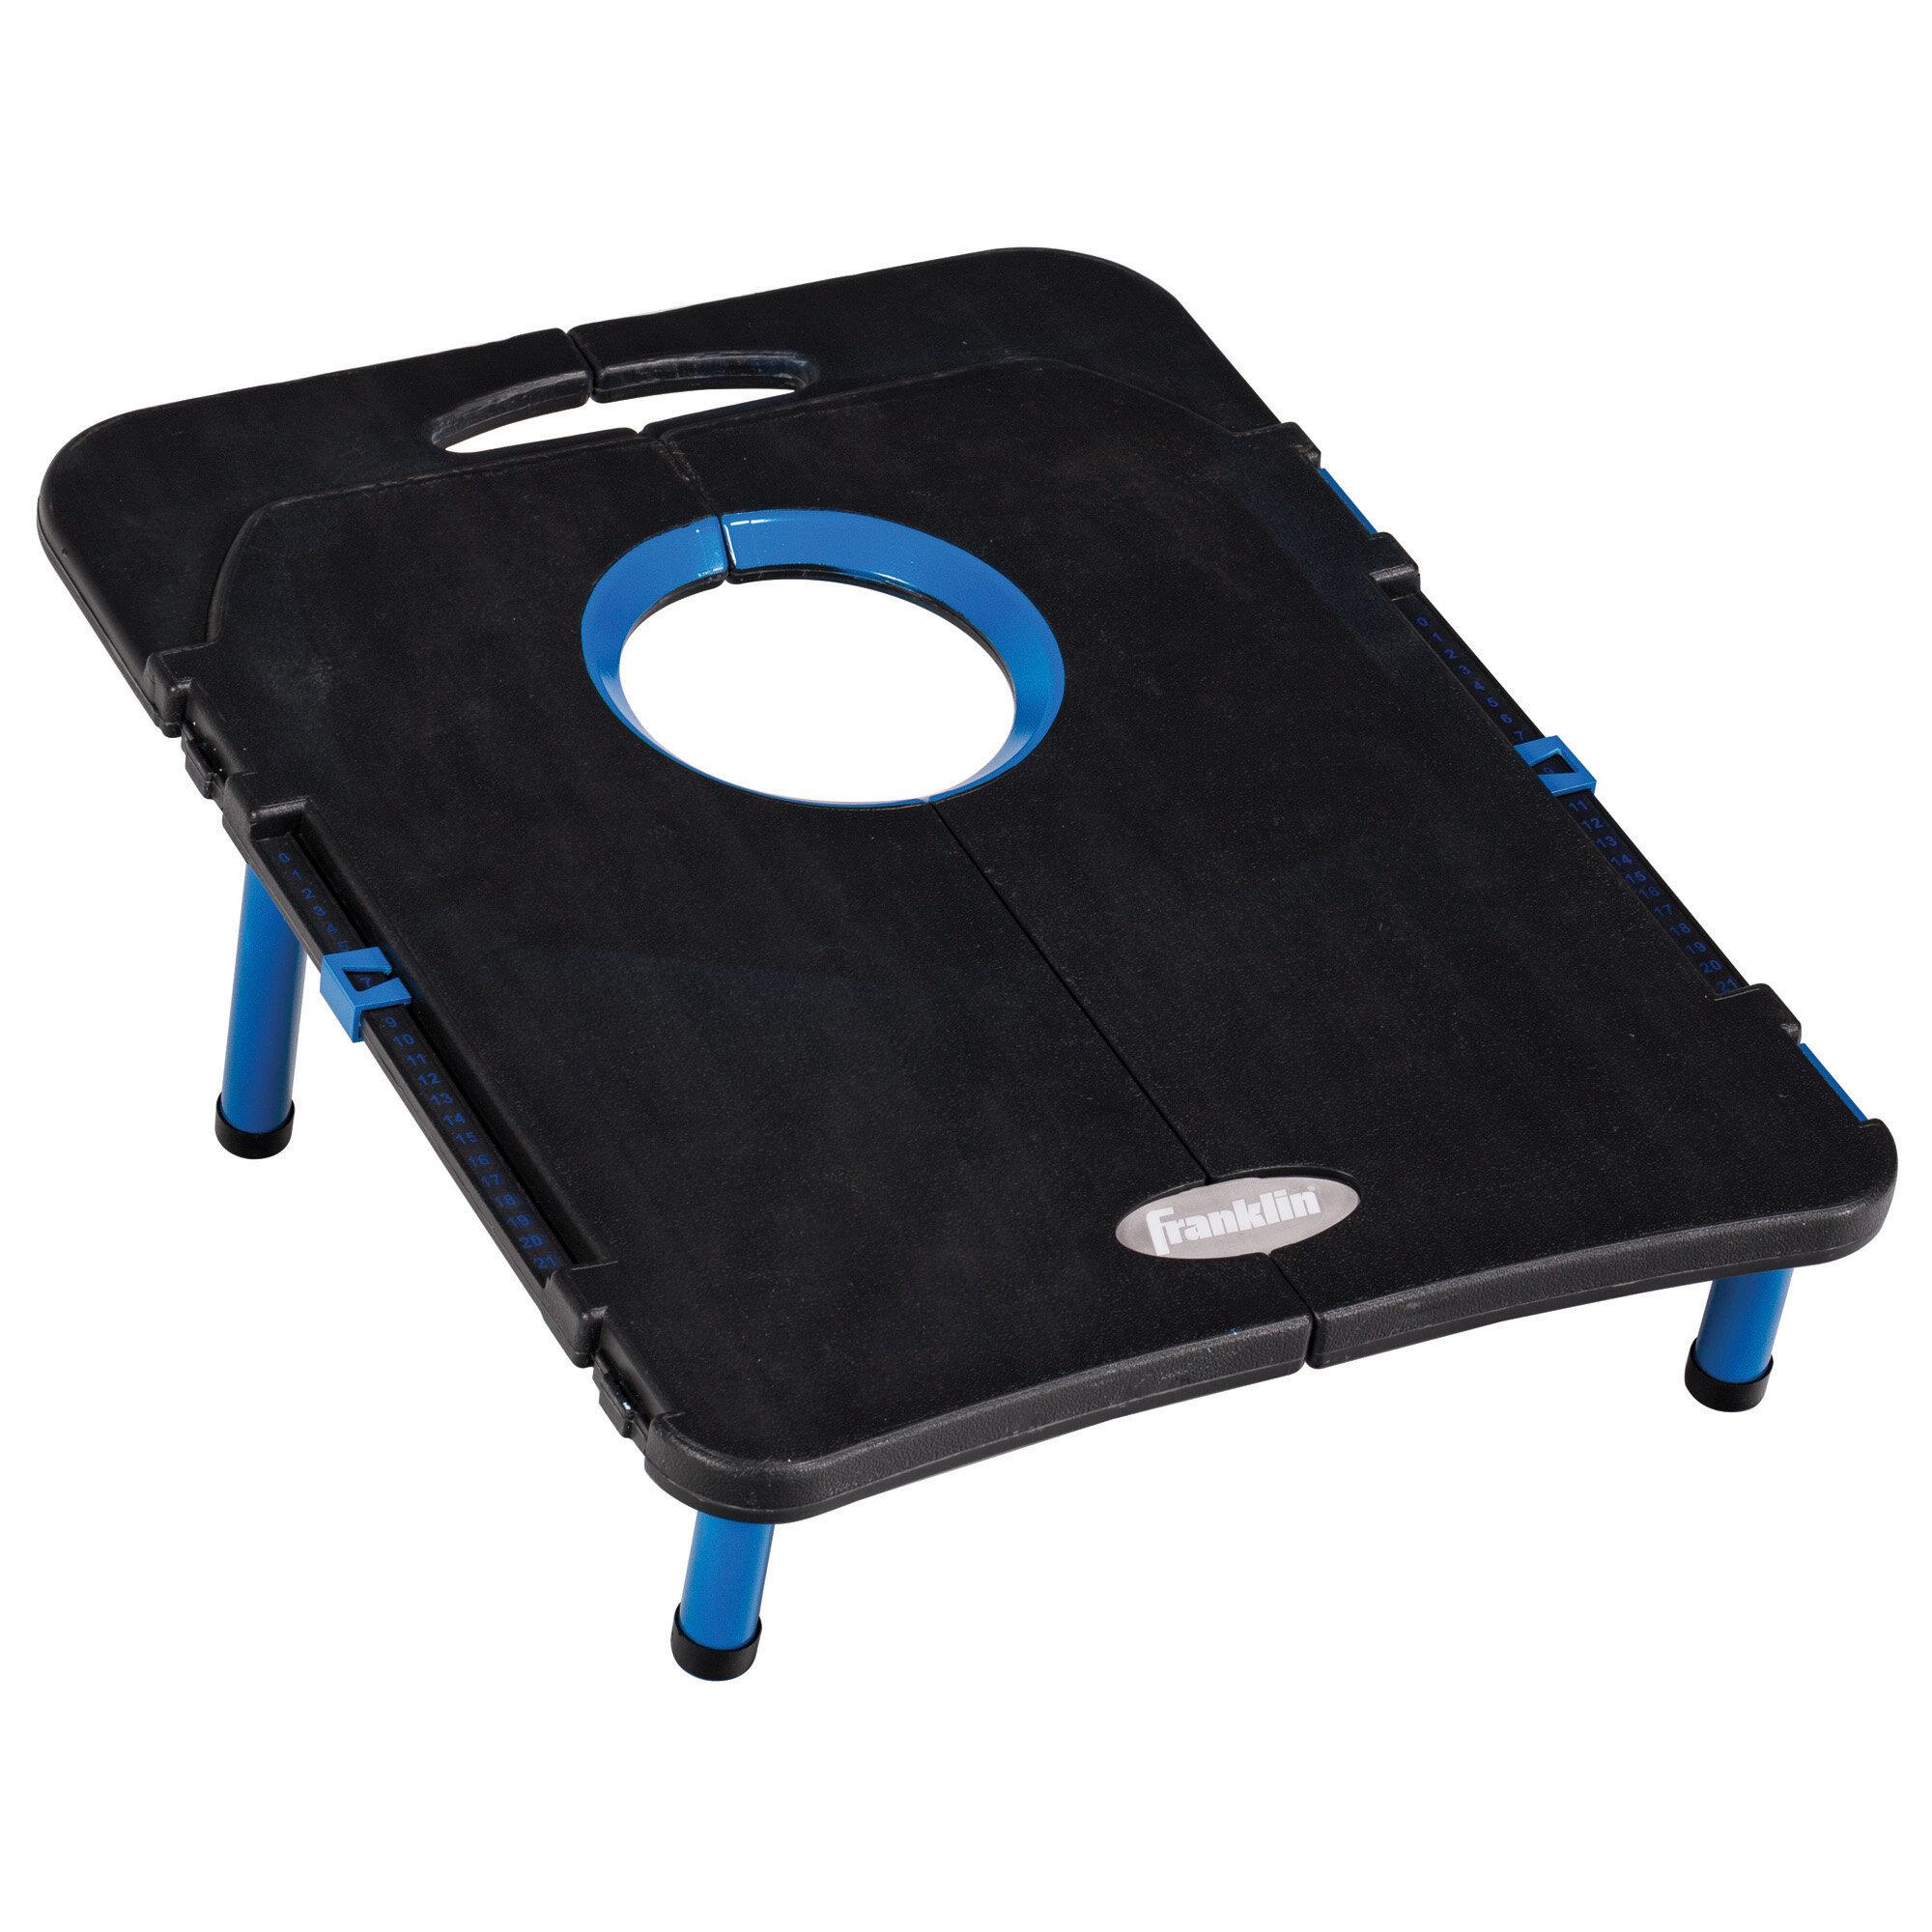 Cool 2 X 1 All Weather Bean Bag Toss Plastic Cornhole Board Machost Co Dining Chair Design Ideas Machostcouk